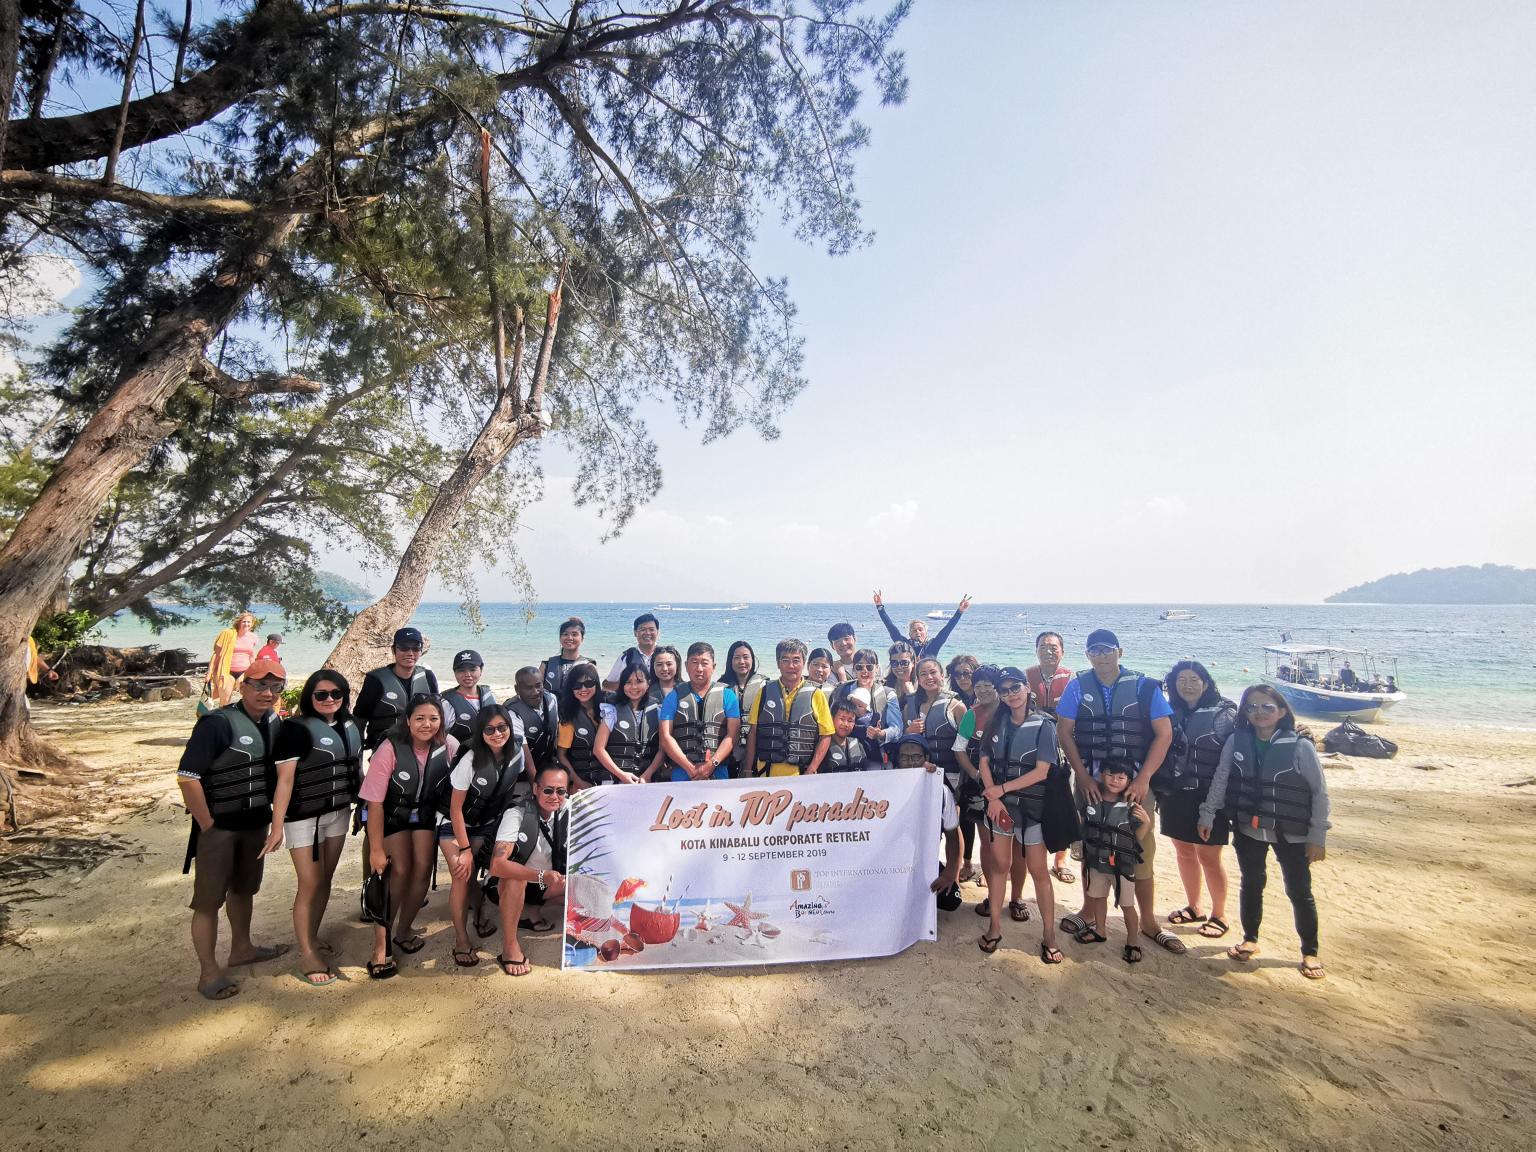 2019 Company Retreat — Kota Kinabalu, Malaysia